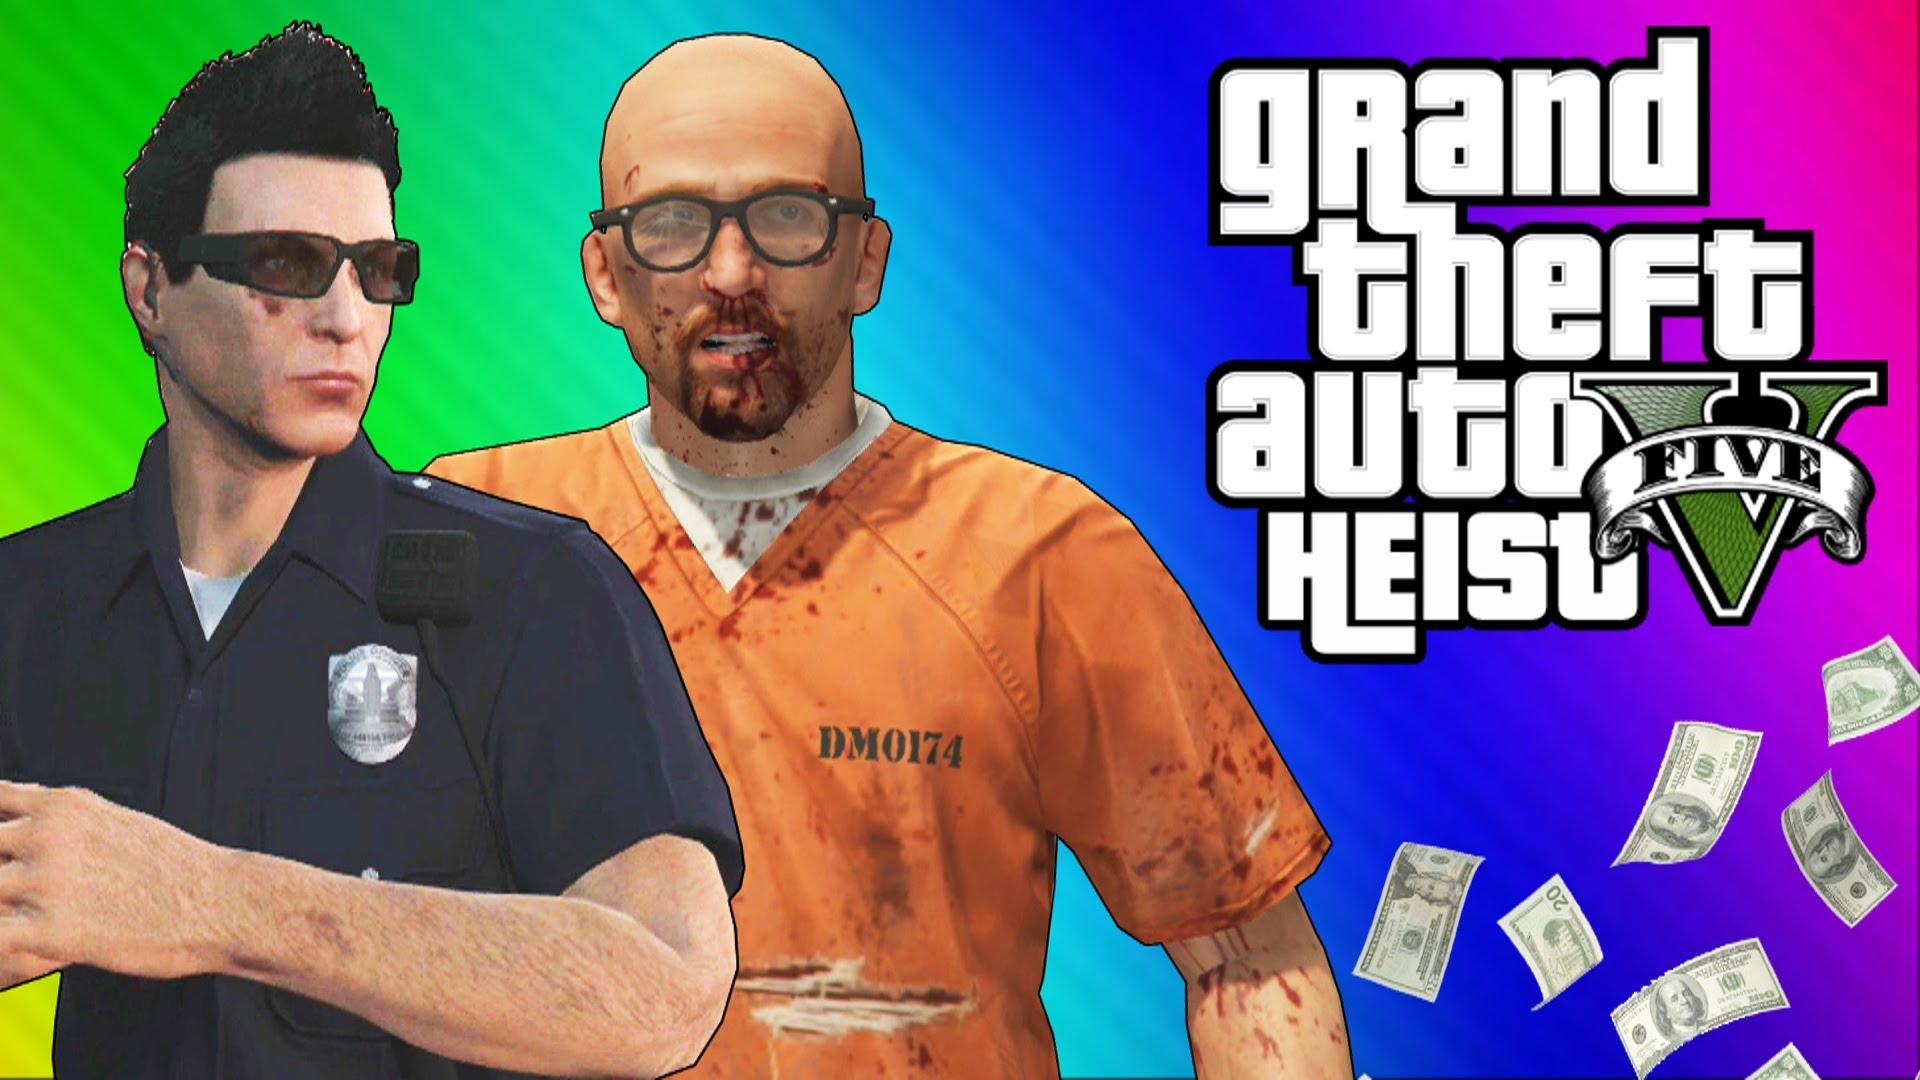 Gta 5 Heists 1 Undercover Cops Prison Break Gta 5 Online Funny Moments Part 2 Inthefame